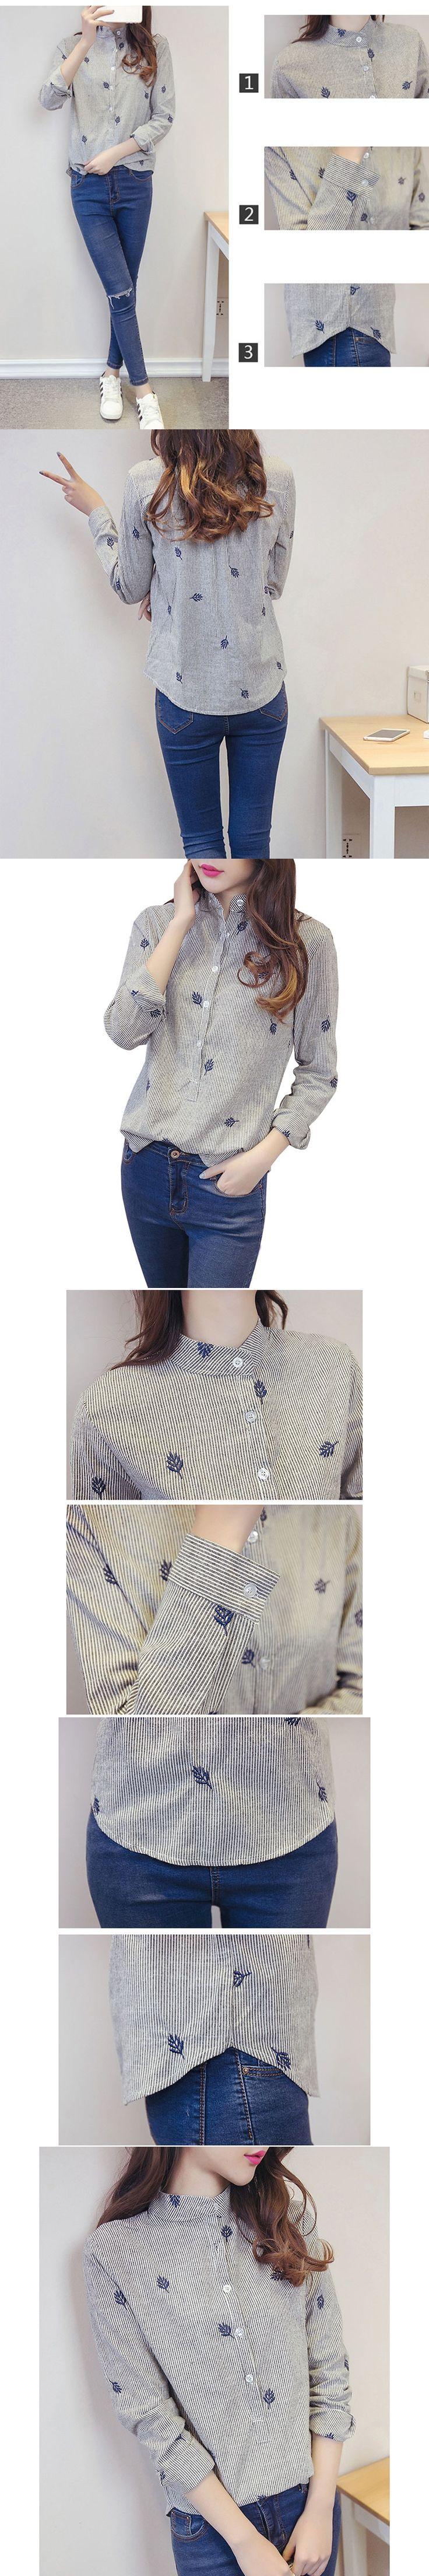 blusas femininas 2017 e camisas long sleeve women blouses cotton casual shirt women tops vetement femme plus size ropa mujer